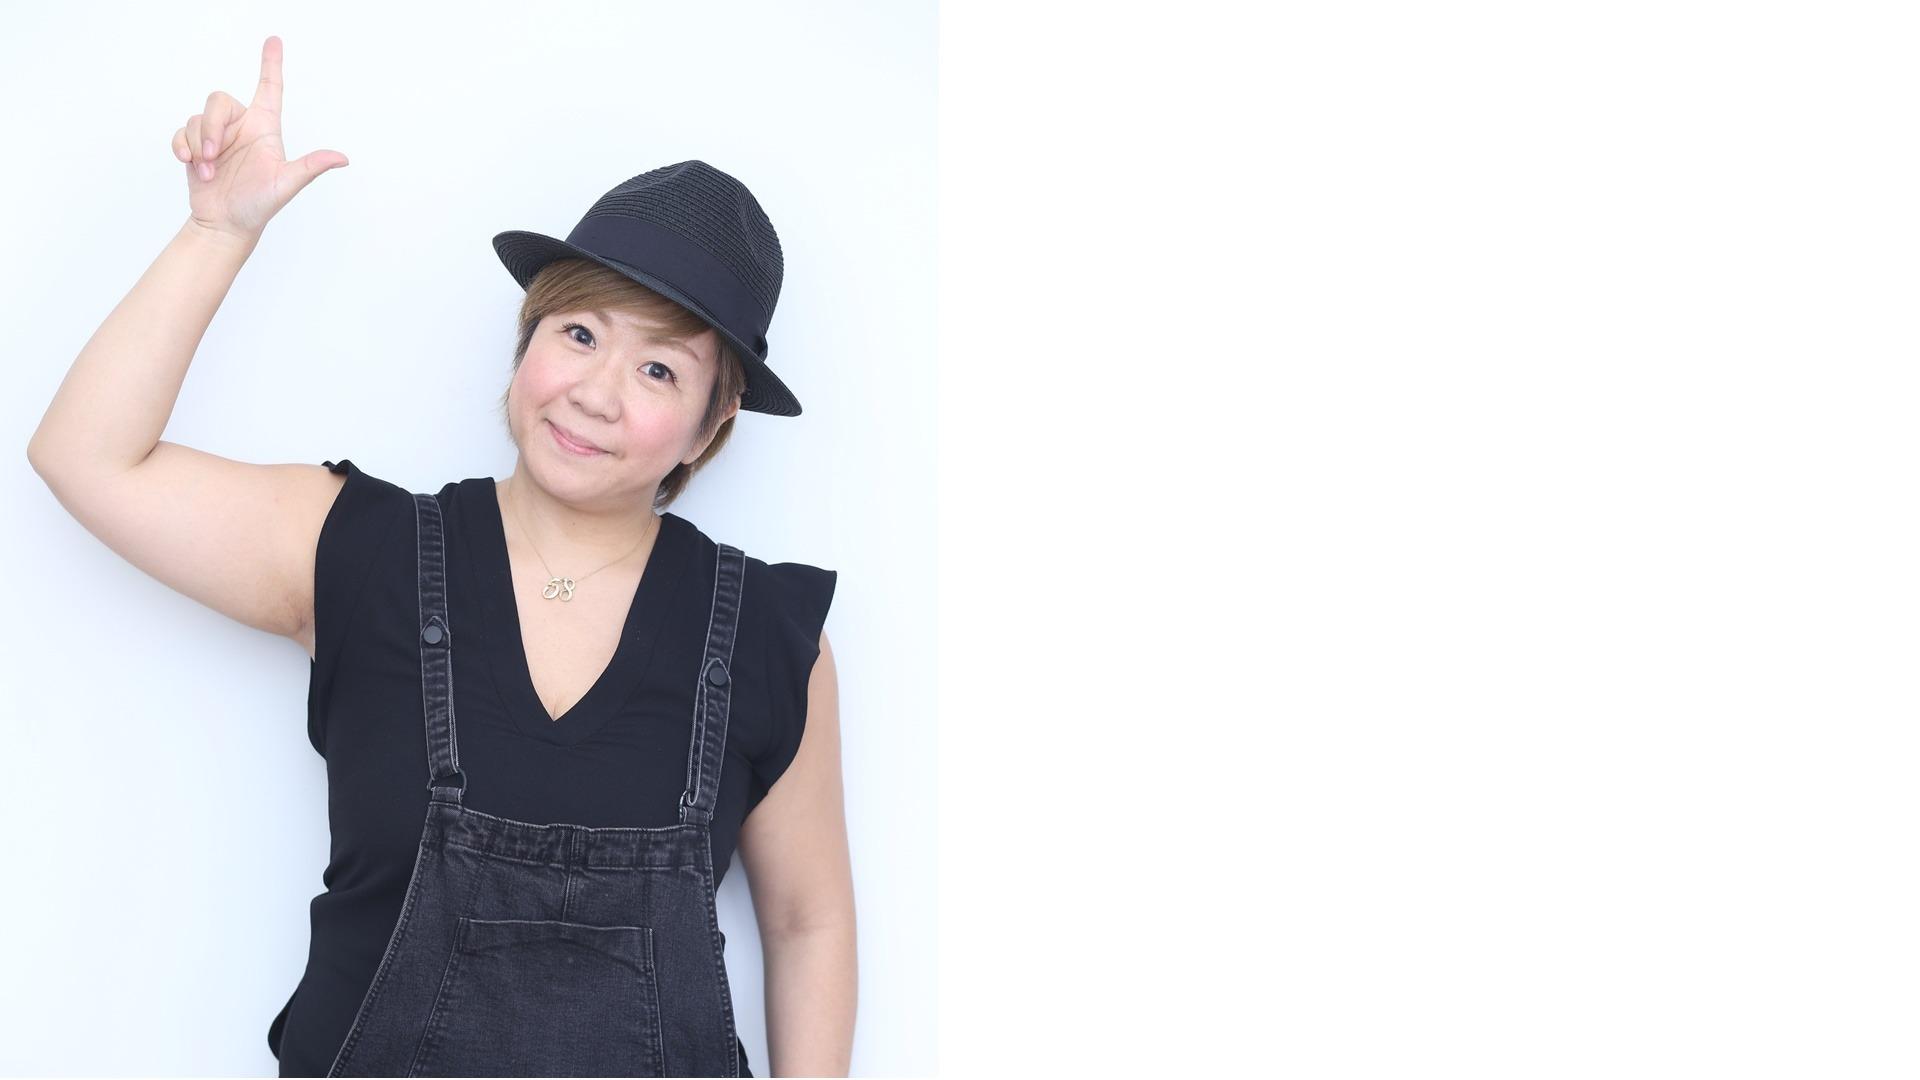 Maki Miura